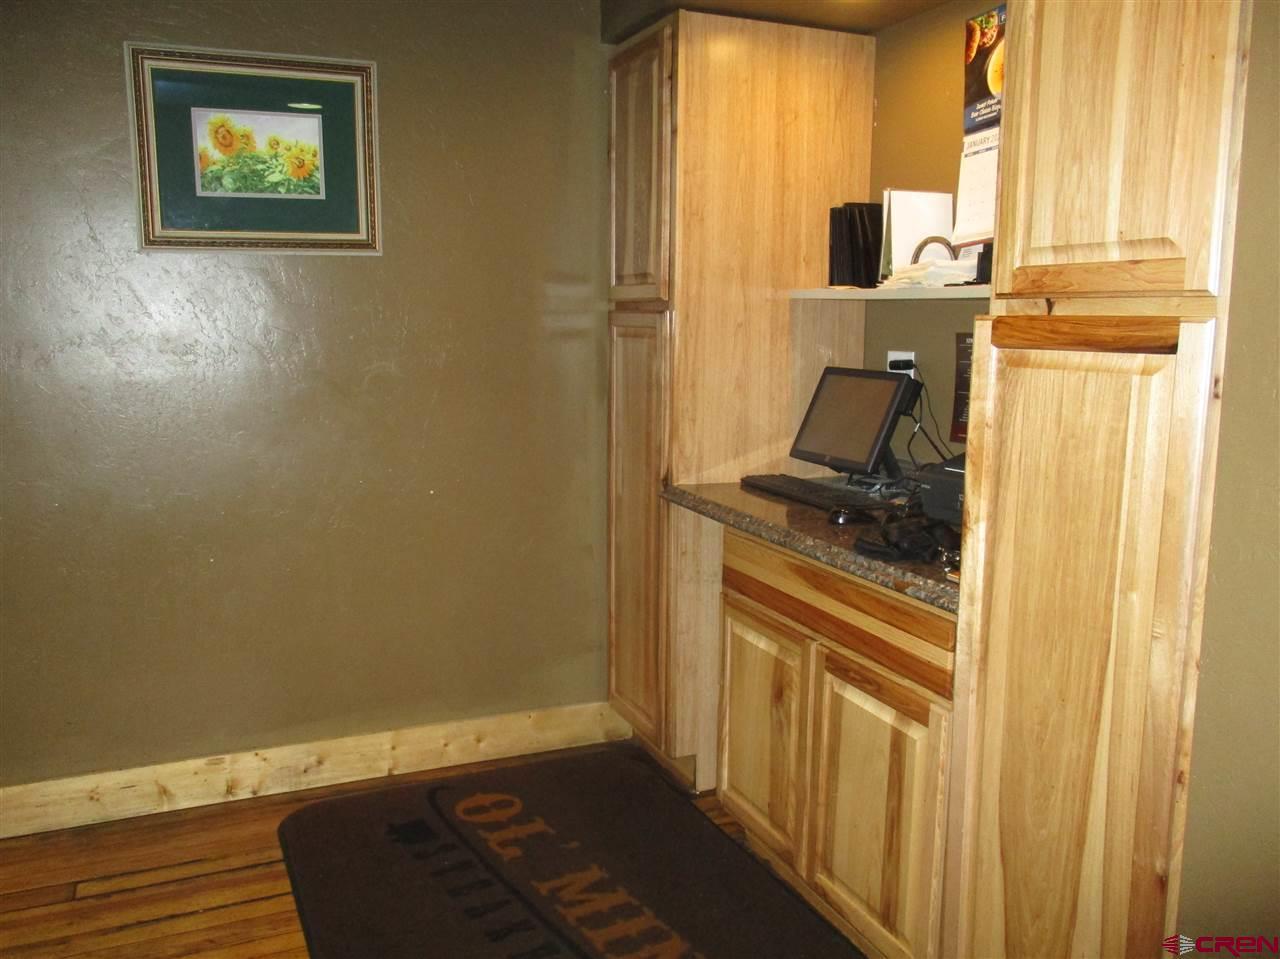 139 N Main Street, Gunnison, Colorado 81230, ,Commercial,For Sale,139 N Main Street,766812